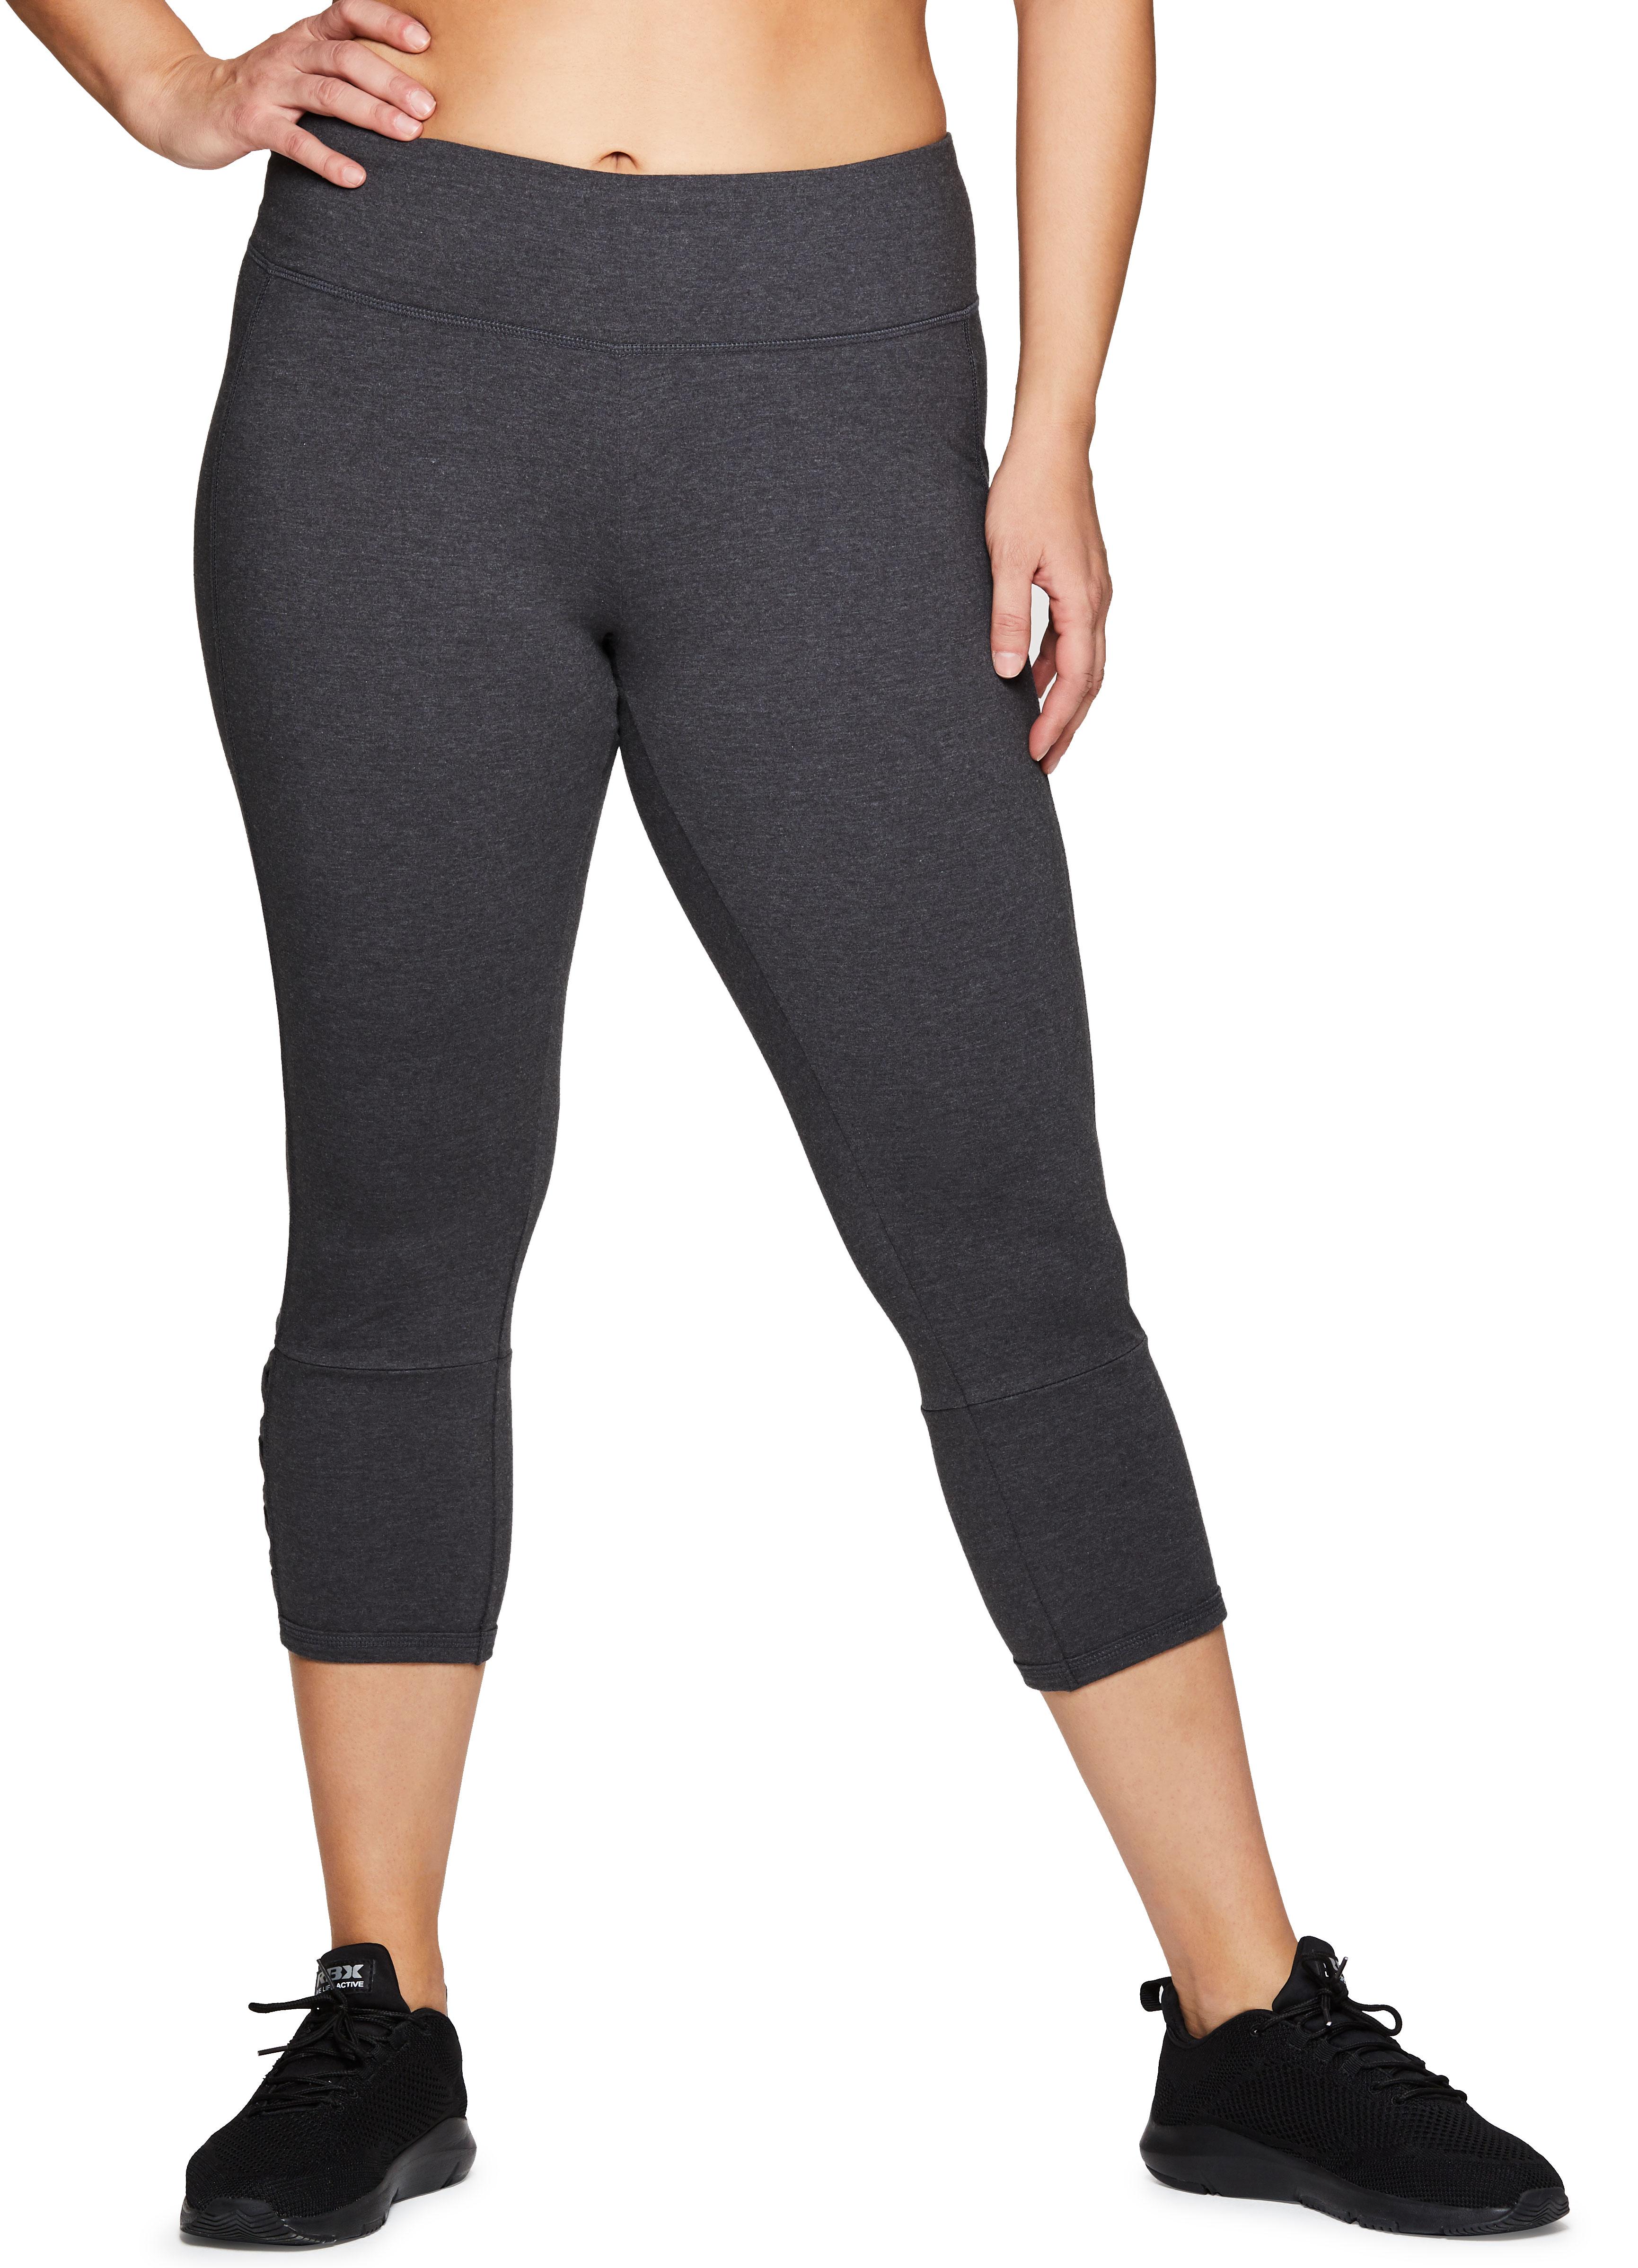 ba8b3df38f RBX Active Women's Plus Size Cotton Spandex Fashion Workout Yoga ...